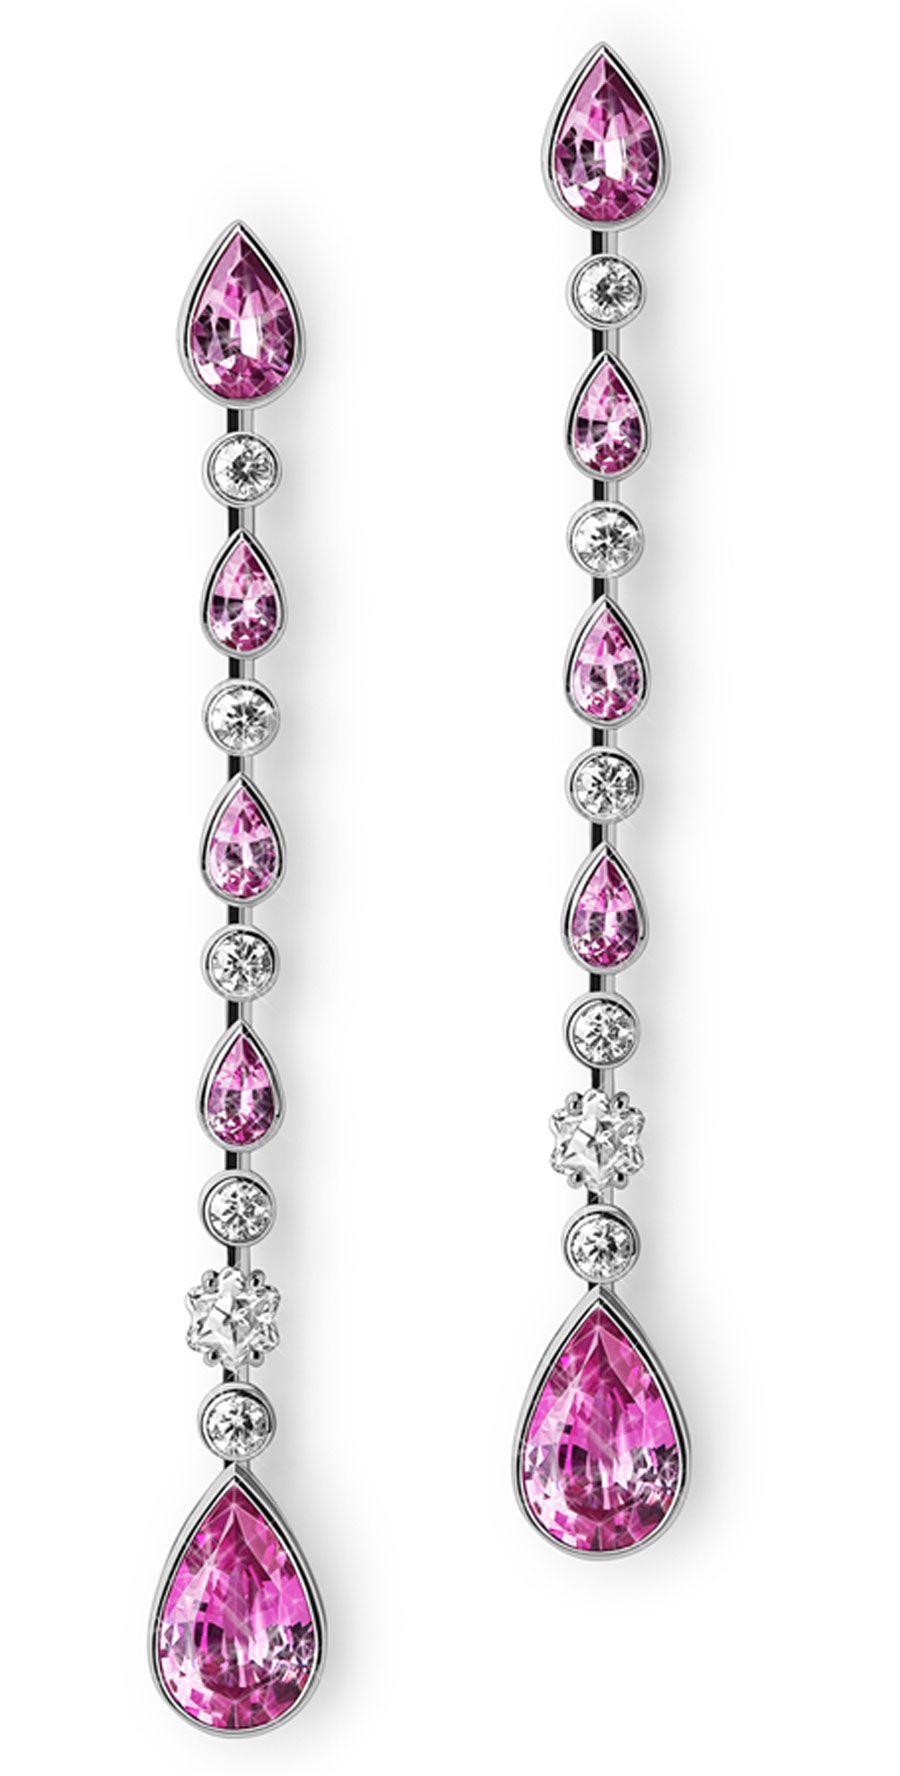 Montblanc Collection Princesse Grace de Monaco, earrings – Fine Jewellery. POA.